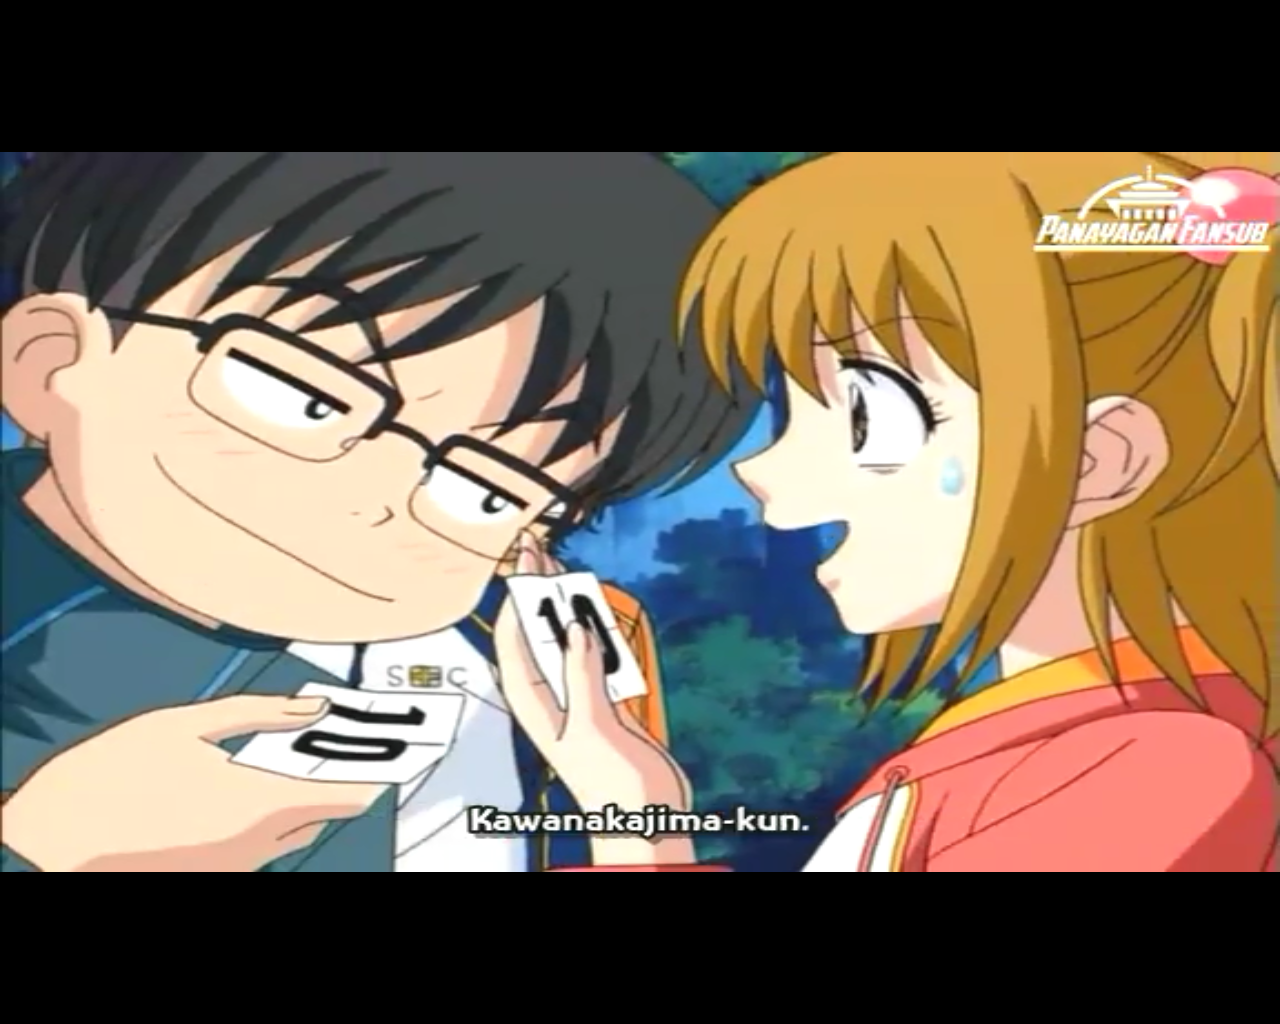 Download Ultra Maniac Episode 06 Subtitle Indonesia